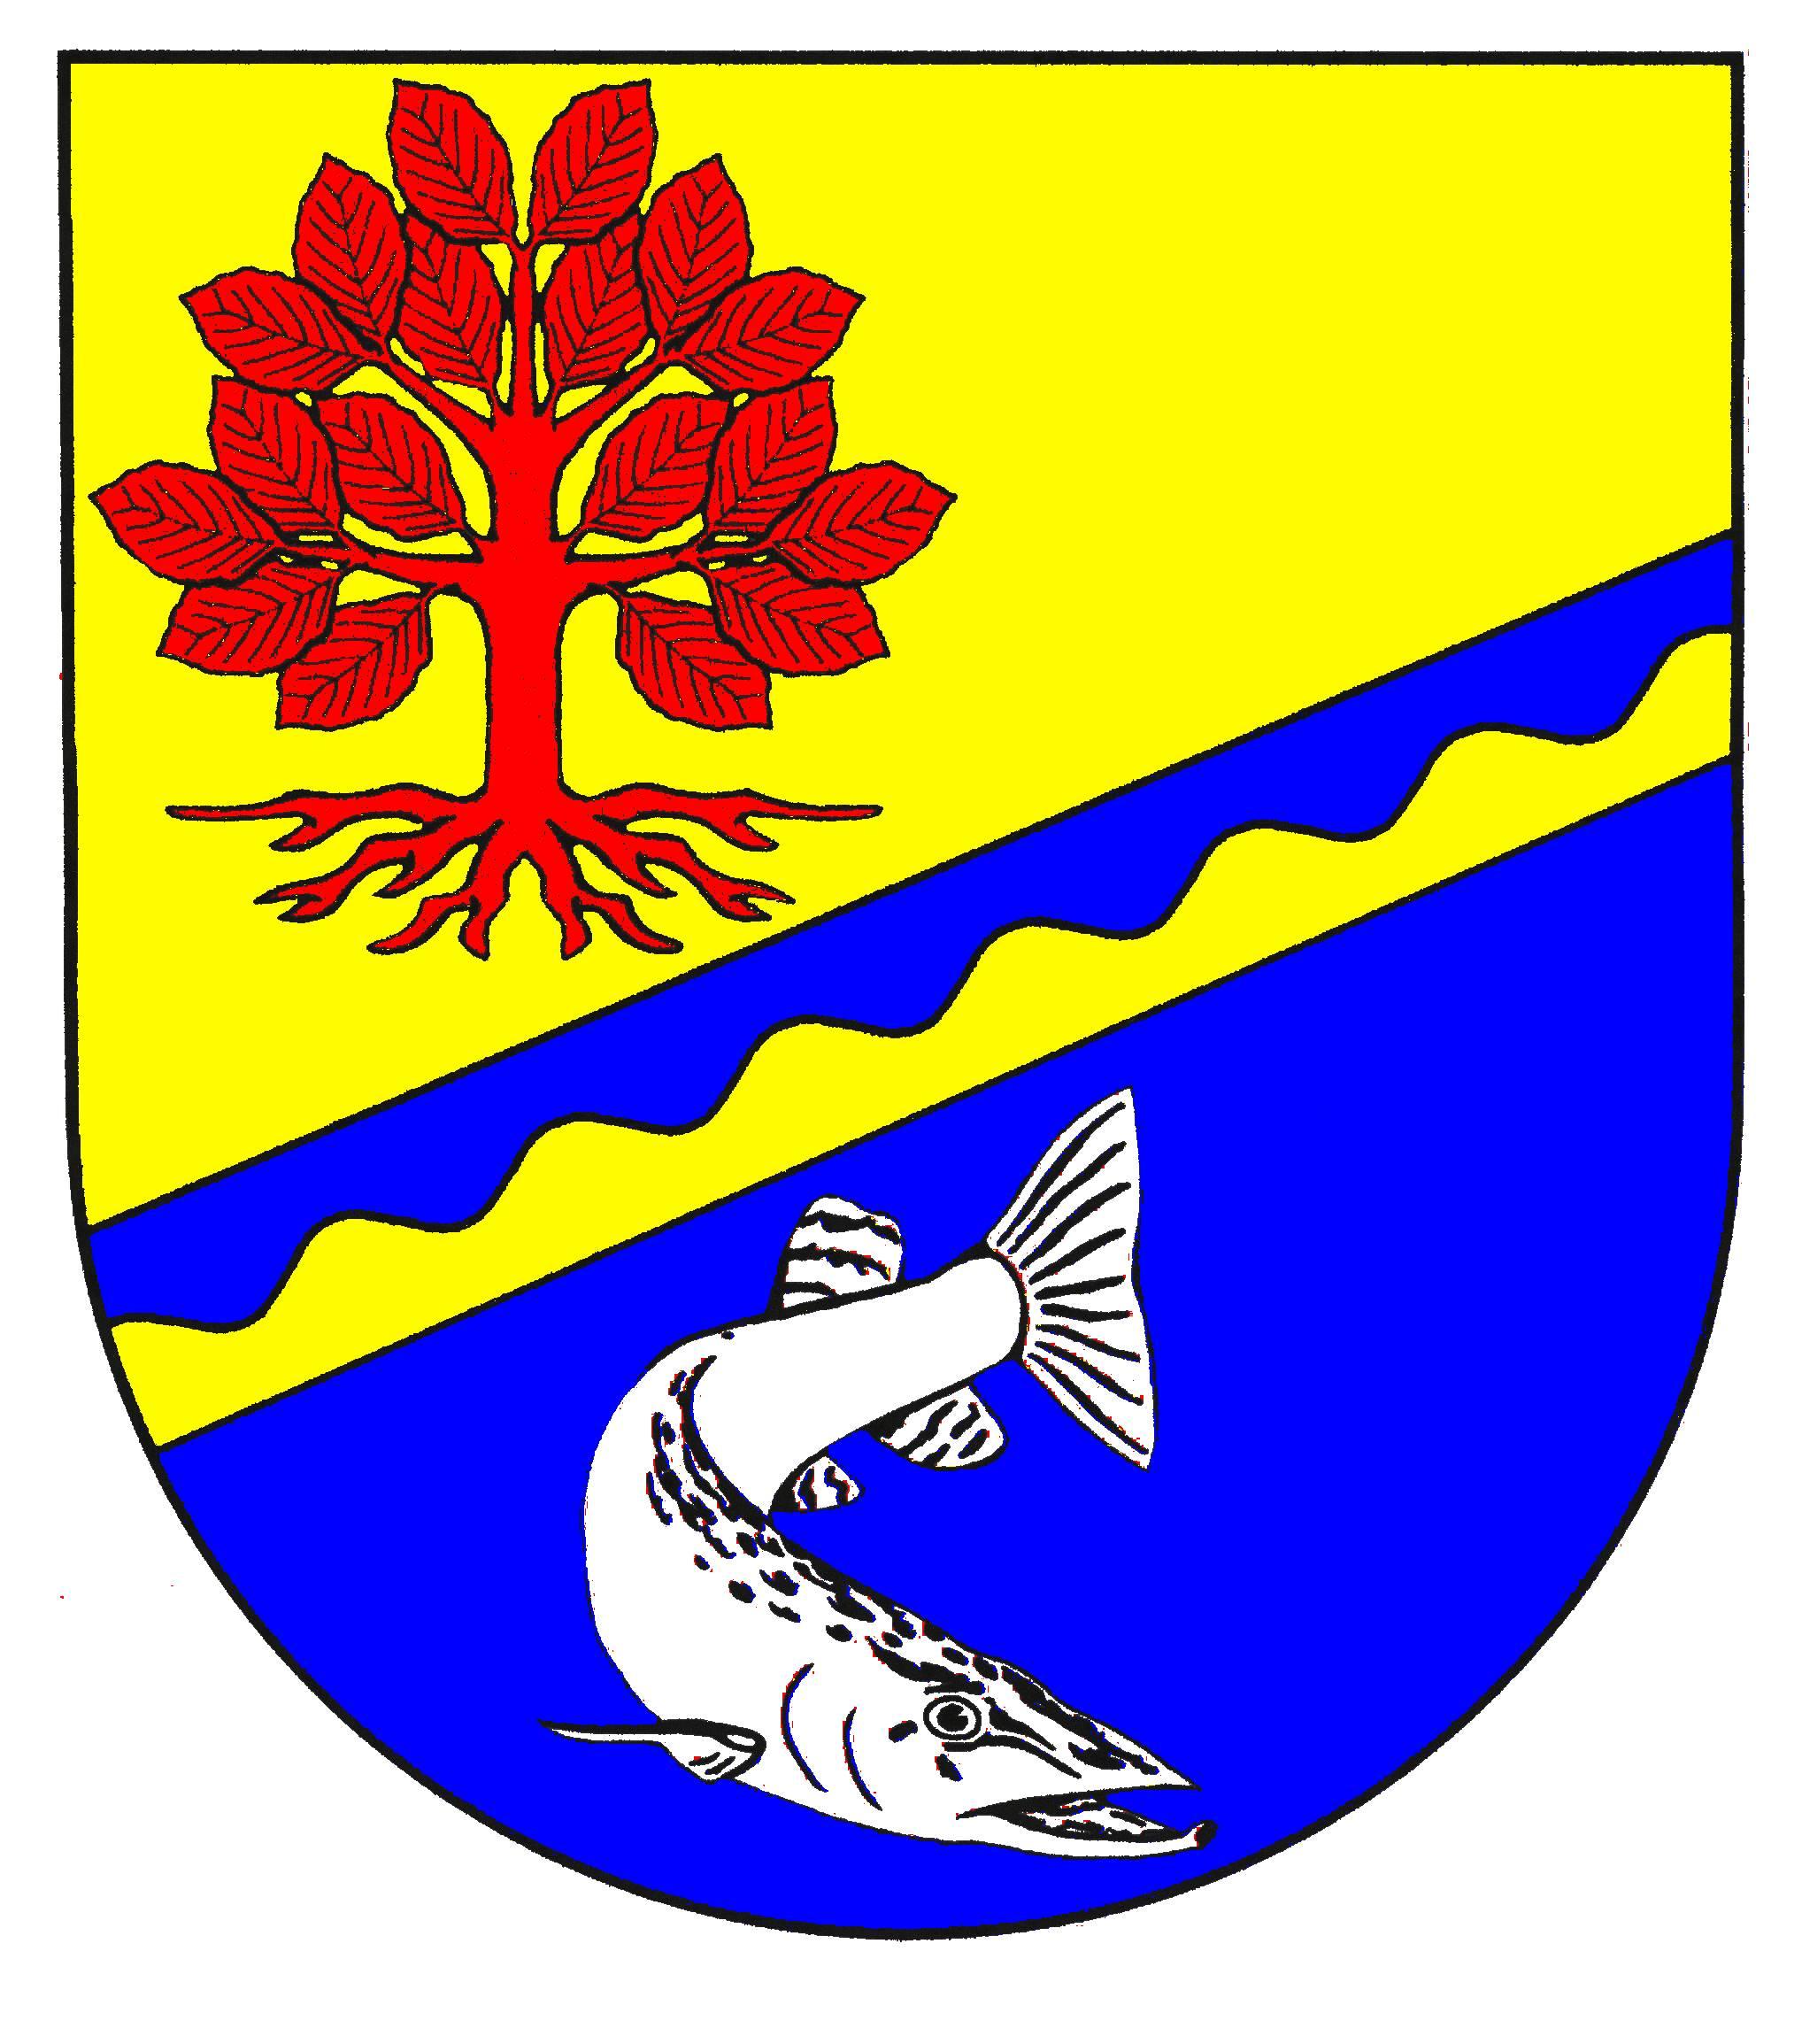 Wappen GemeindeKükels, Kreis Segeberg